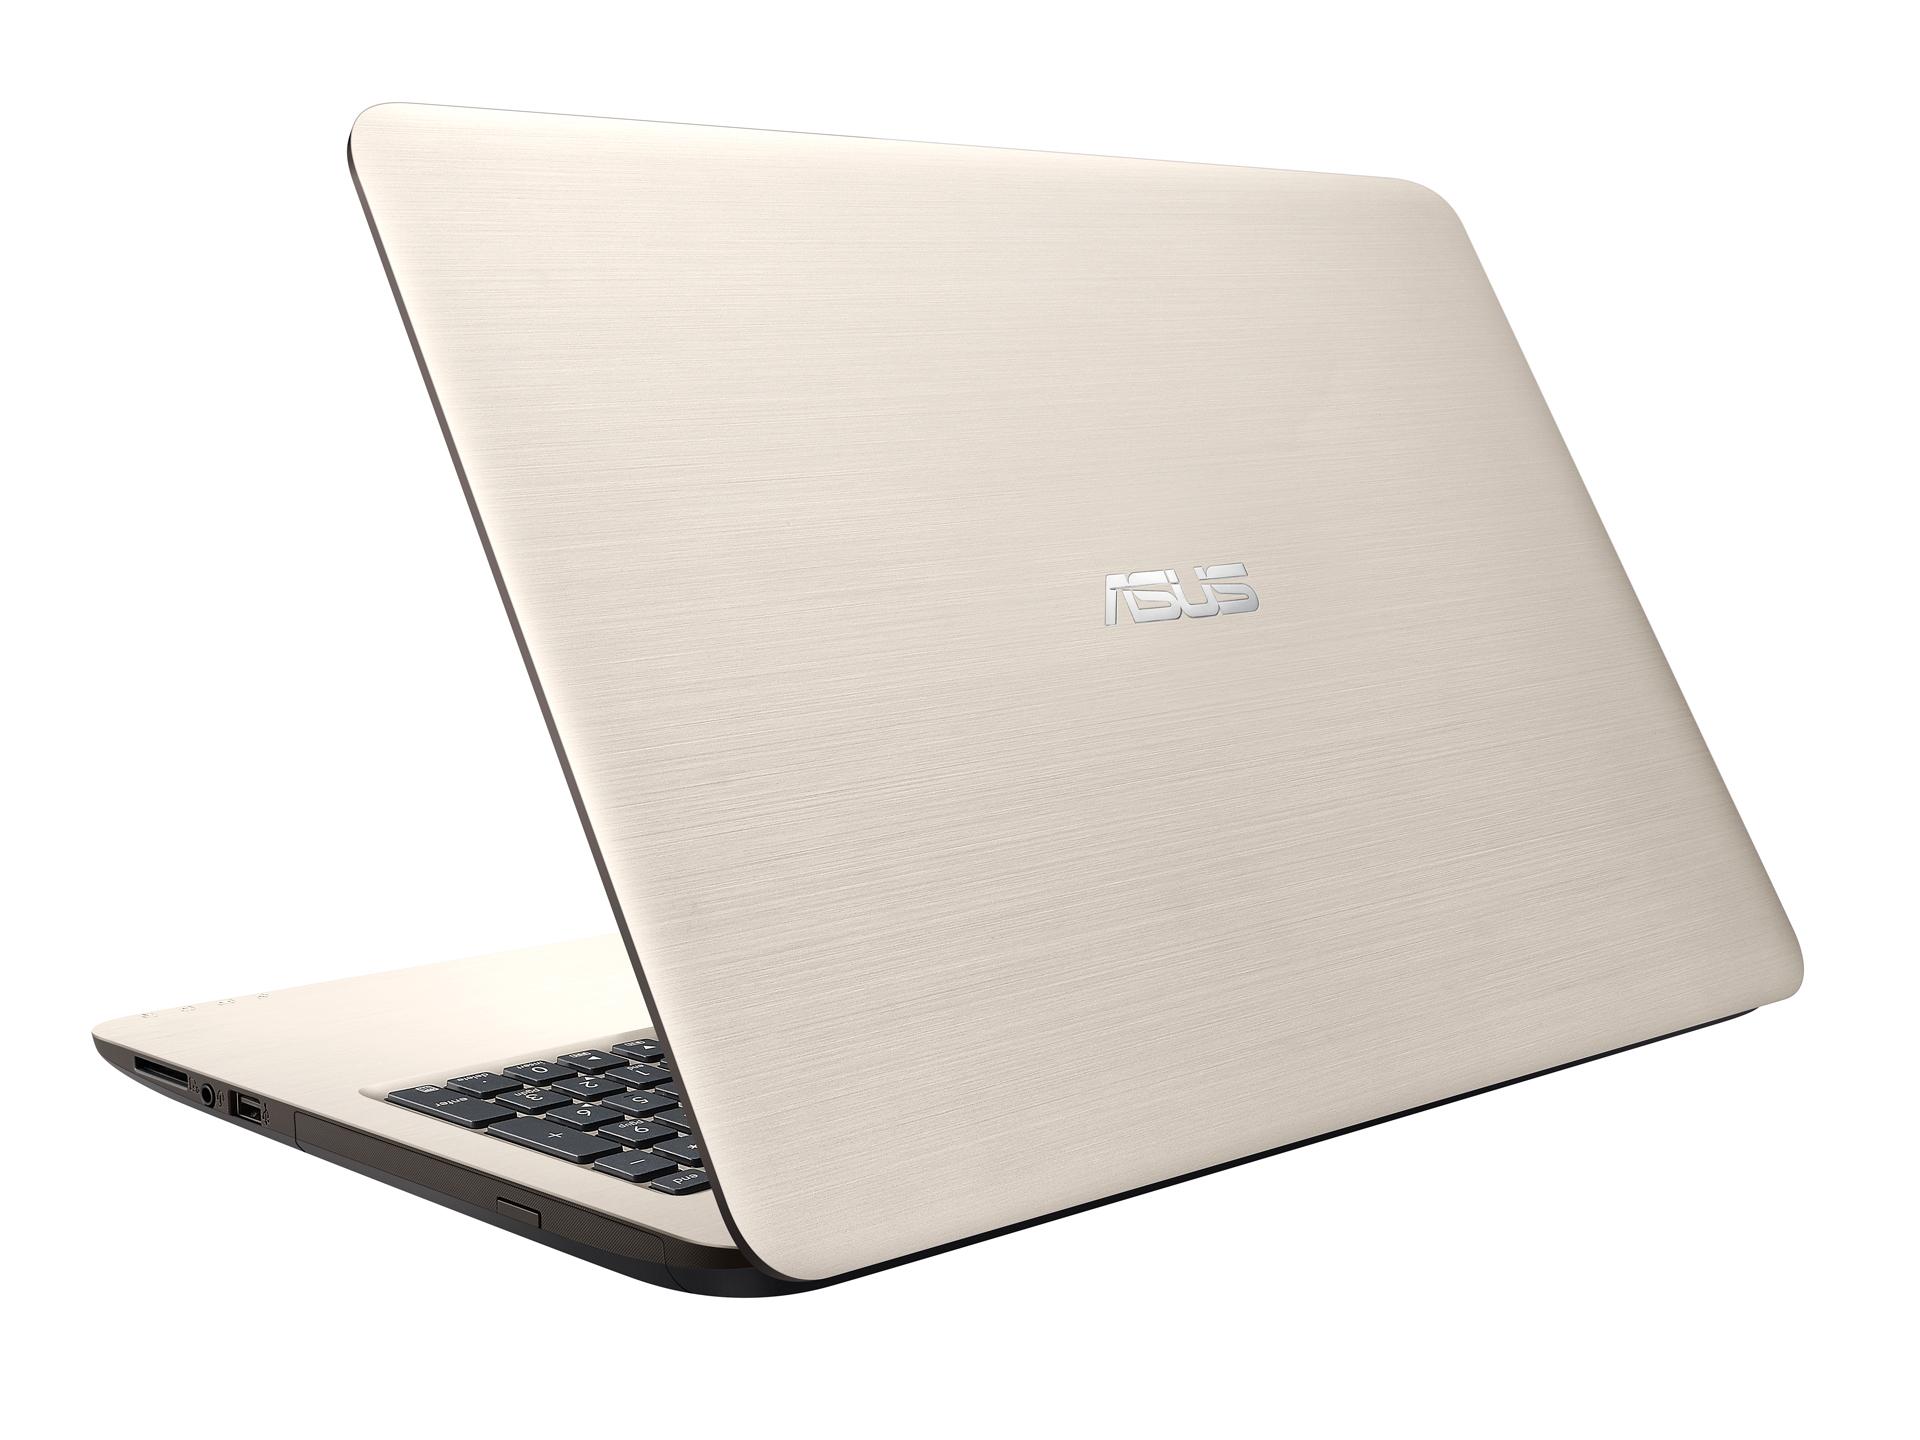 ASUS 華碩 K556UQ-0231C7200U 霧面金 15.6吋 筆記型電腦多少錢